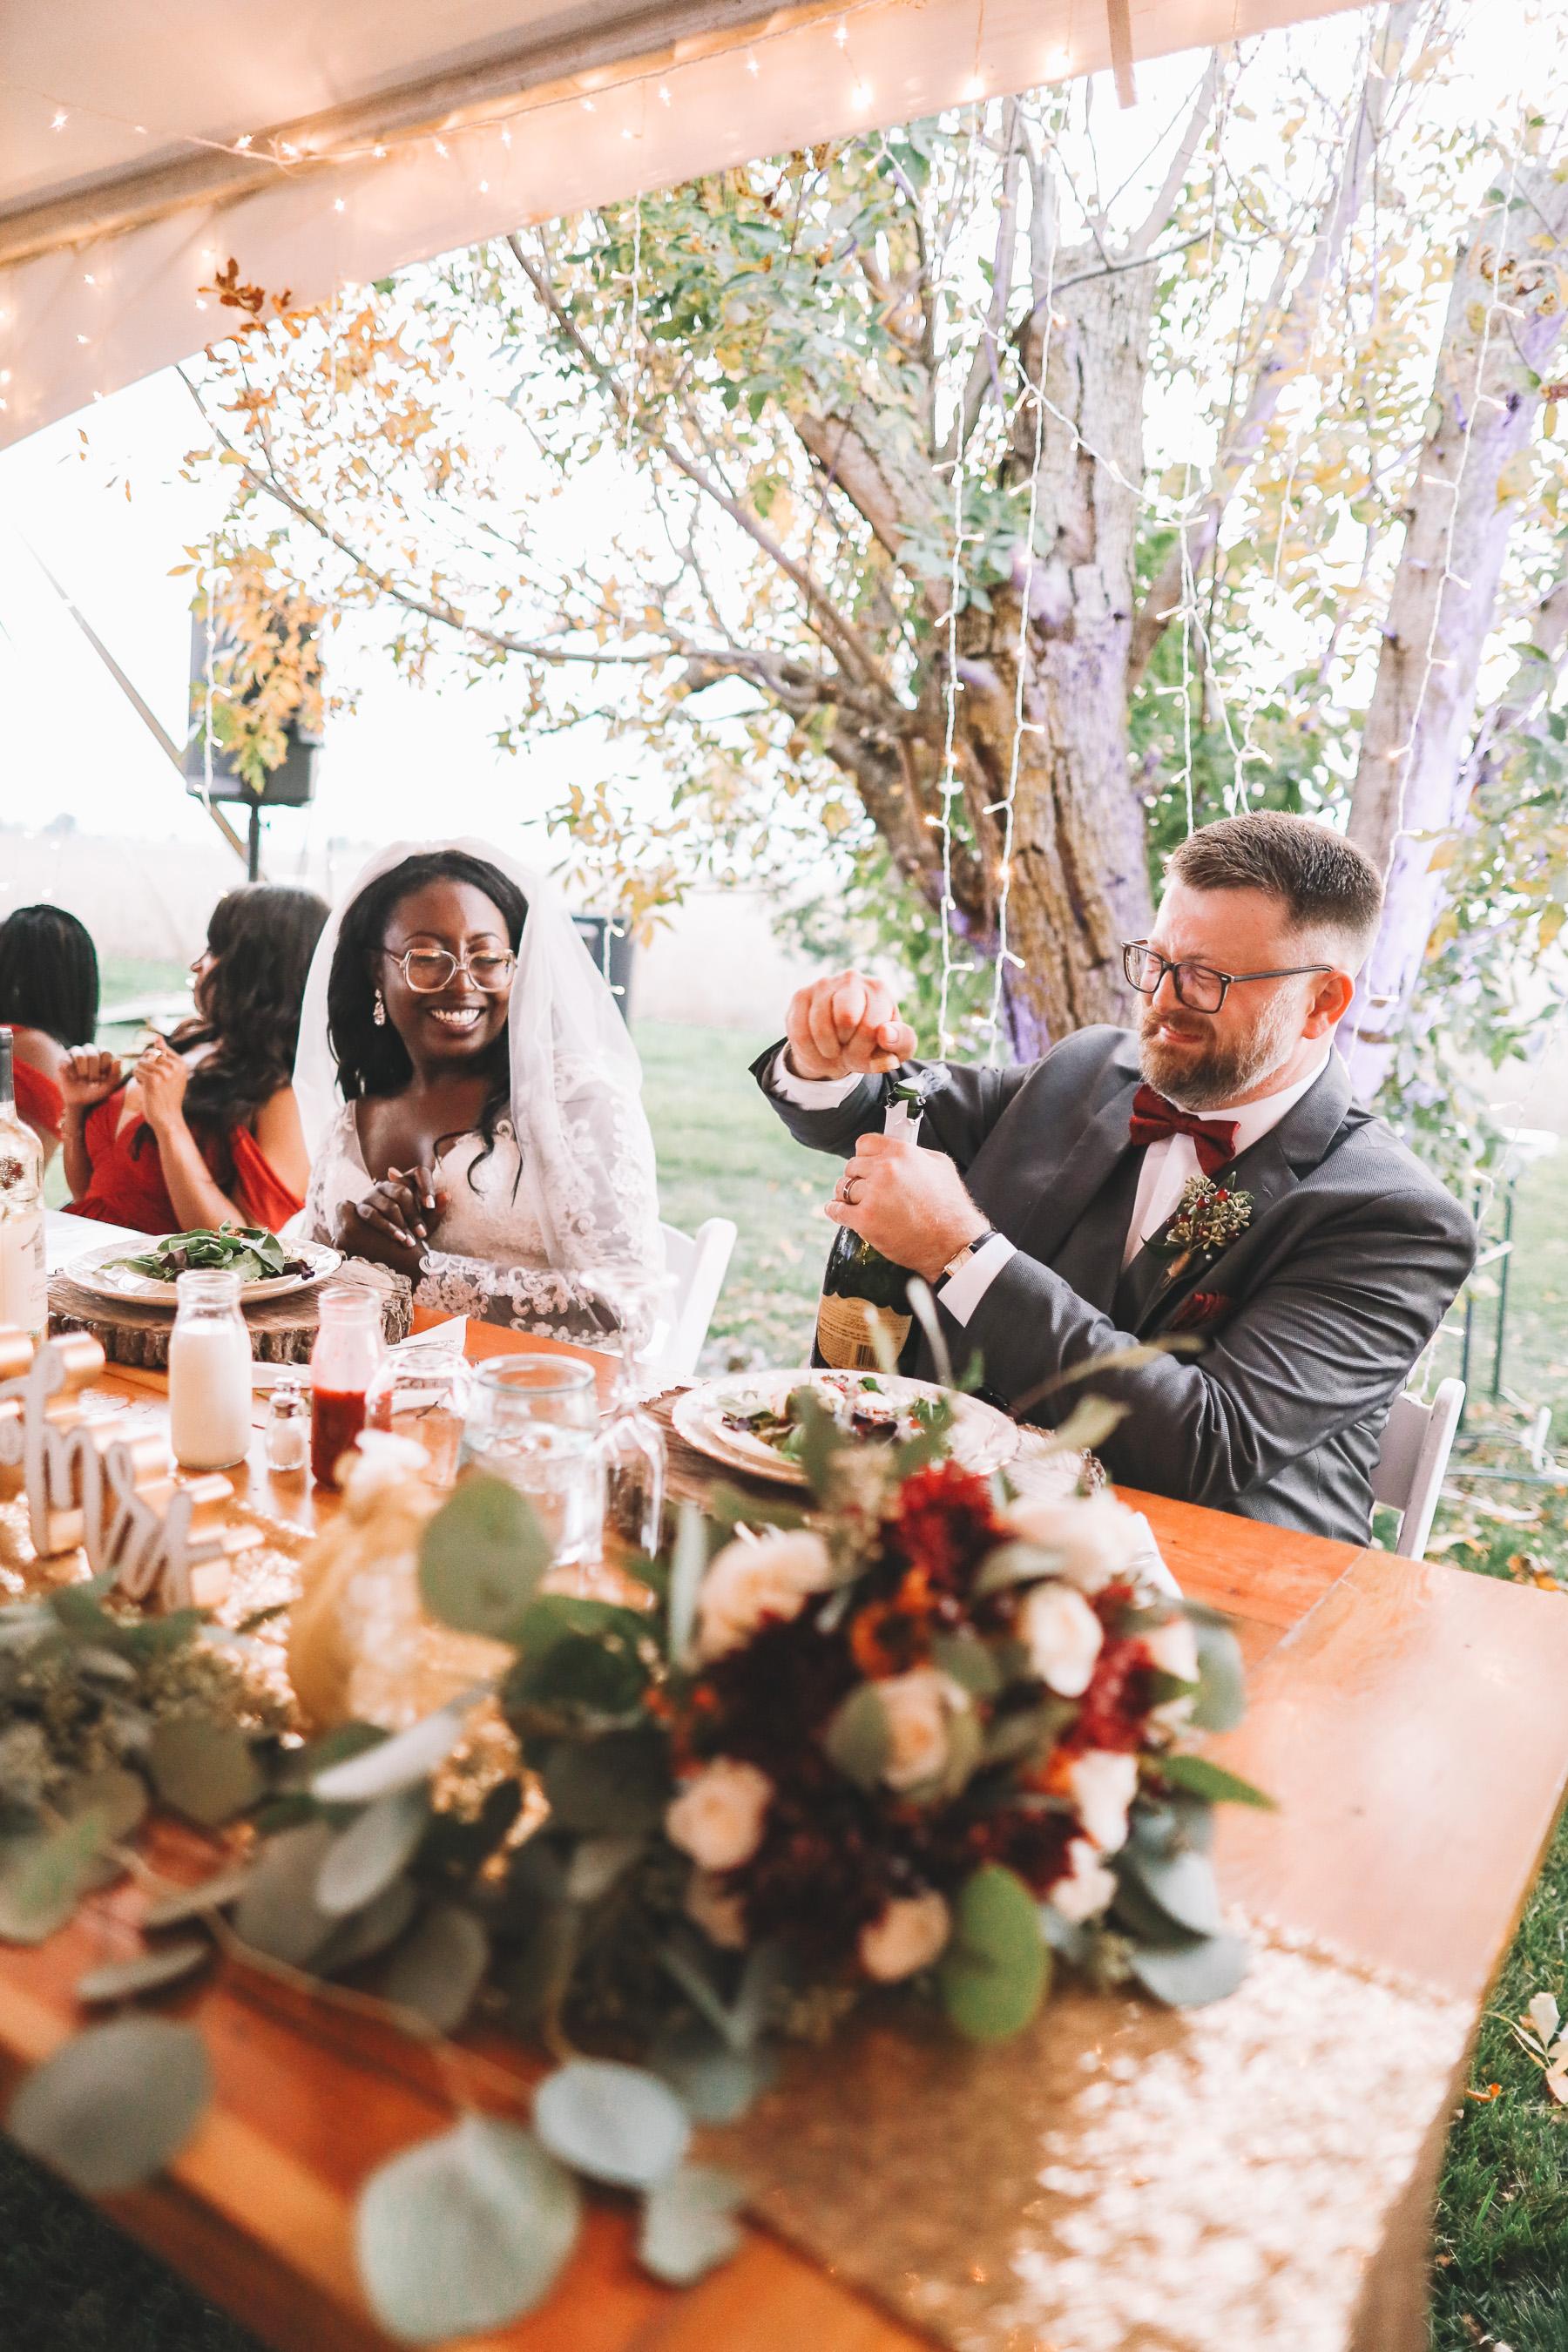 wedding reception ideas | Charlie and Shirleys Wedding